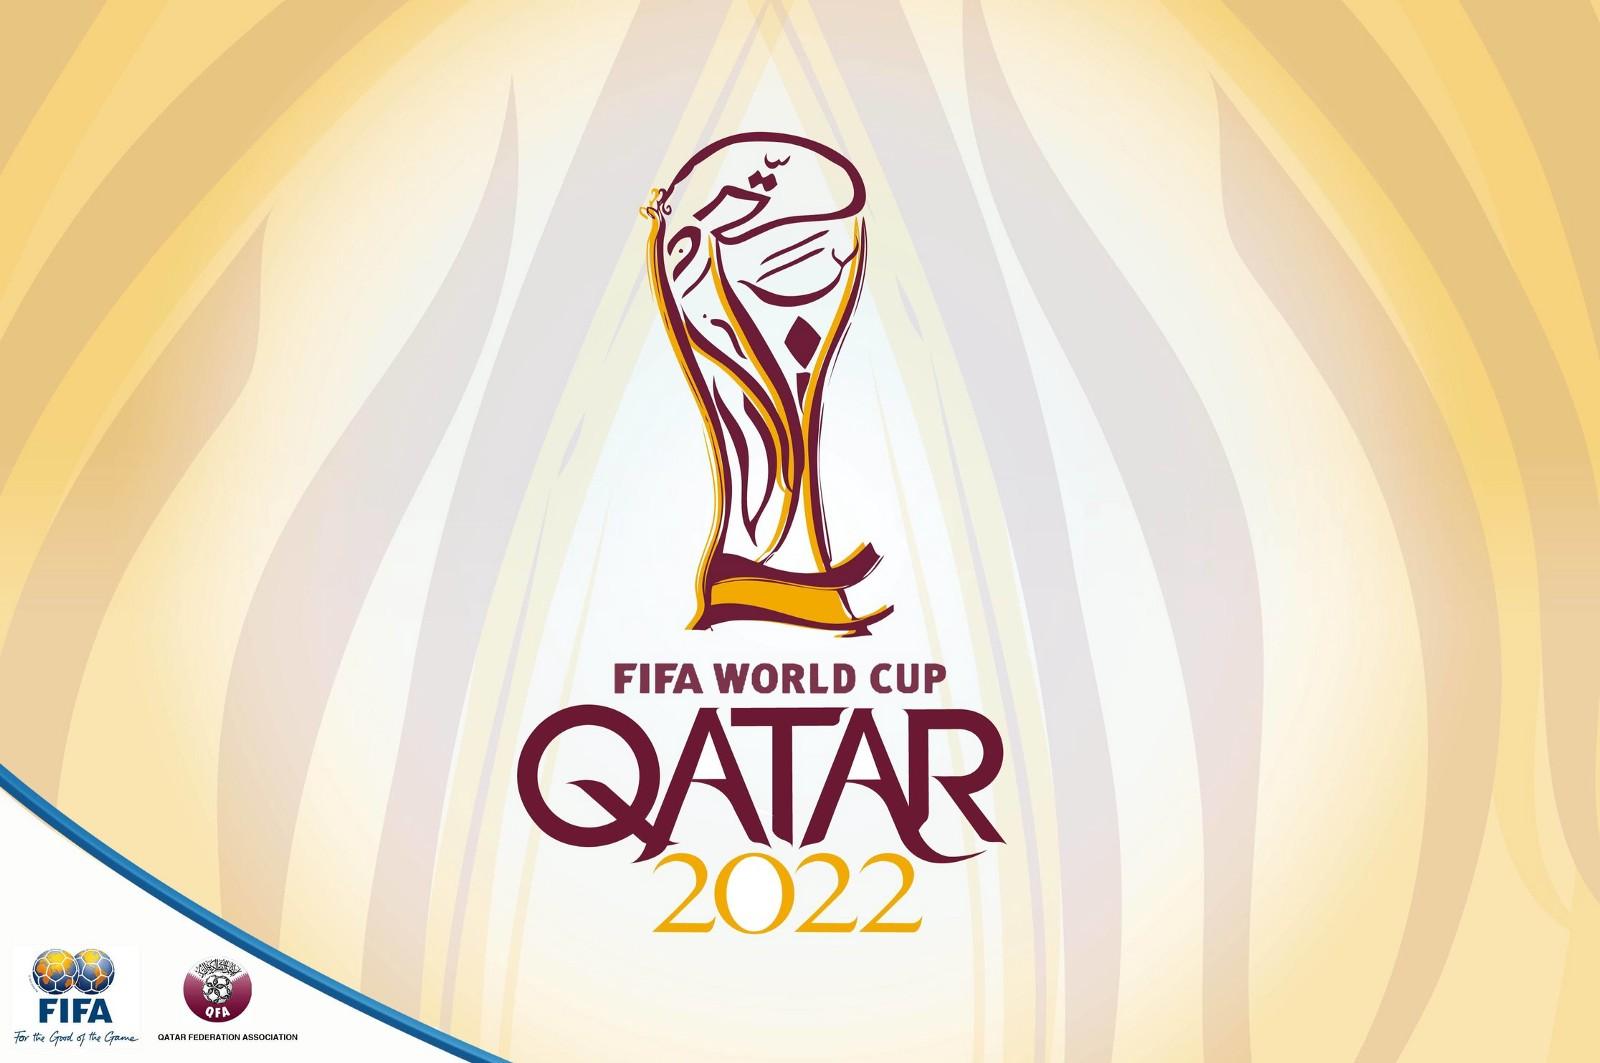 World Cup 2022, 48 đội, FIFA, Pogba, Lukaku, mu, manchester united, juventus, chelsea, conte, sarri, inter milan, chuyển nhượng